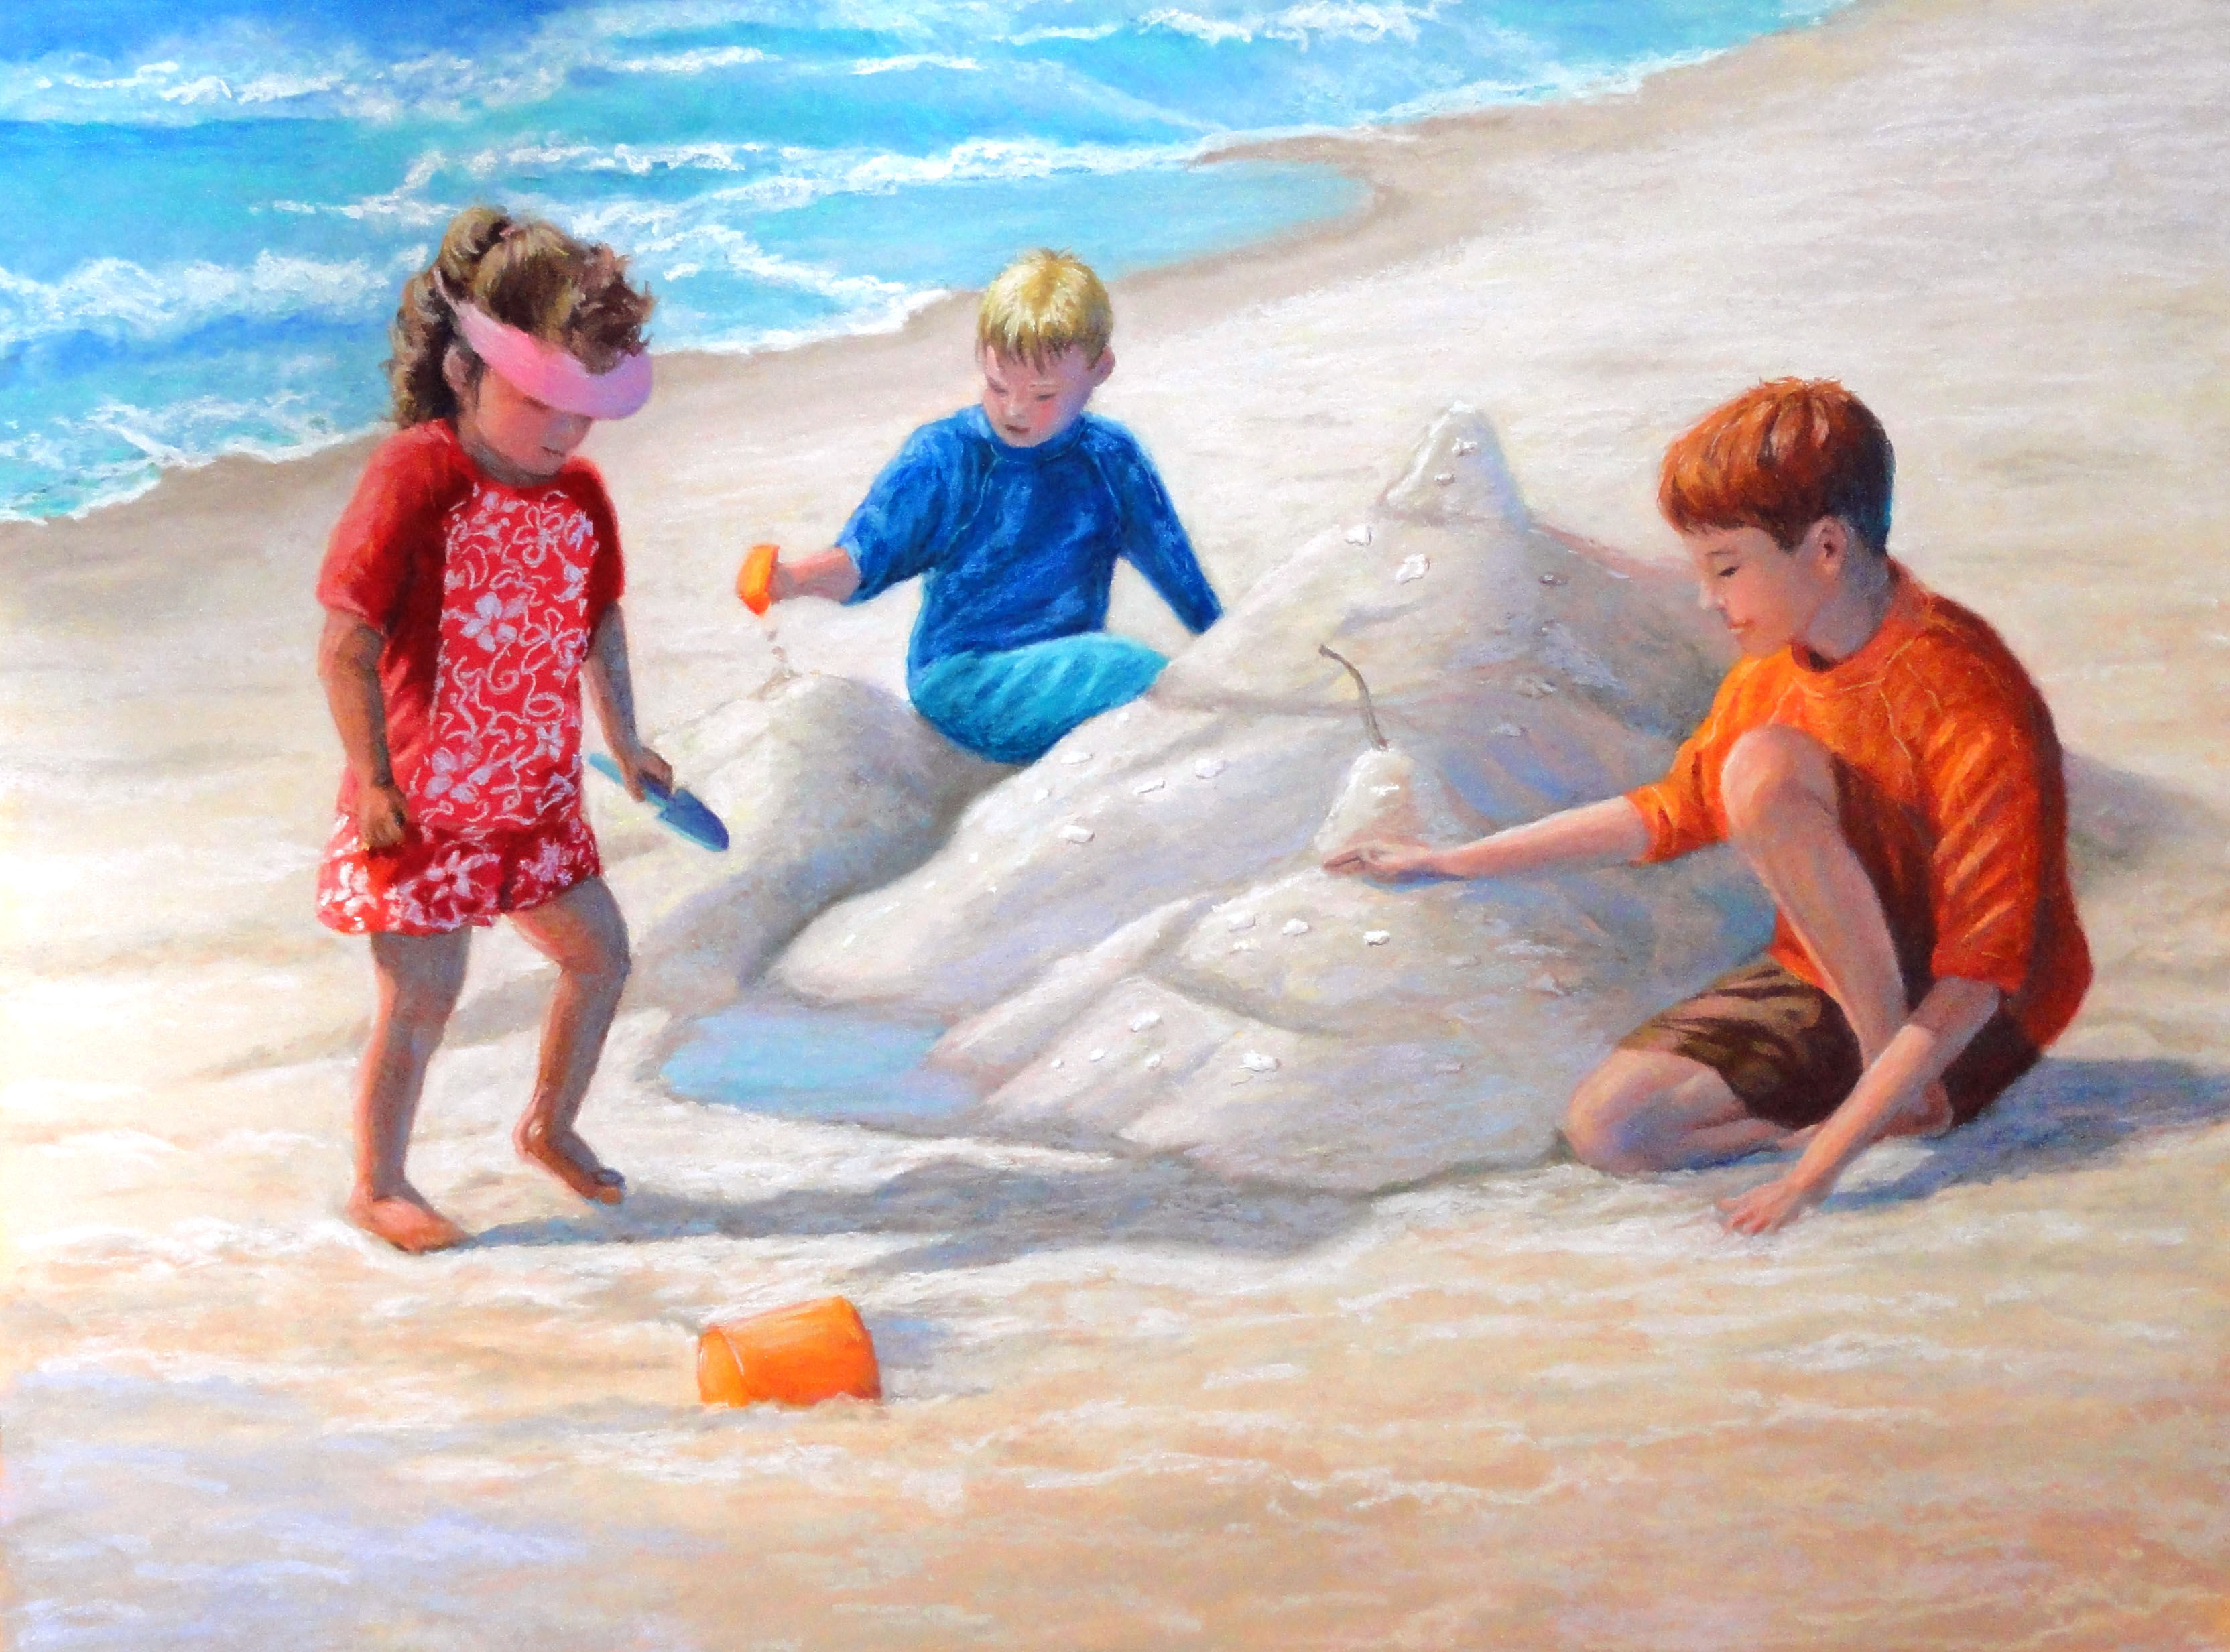 Sand Castles Natural, K. Waltermire